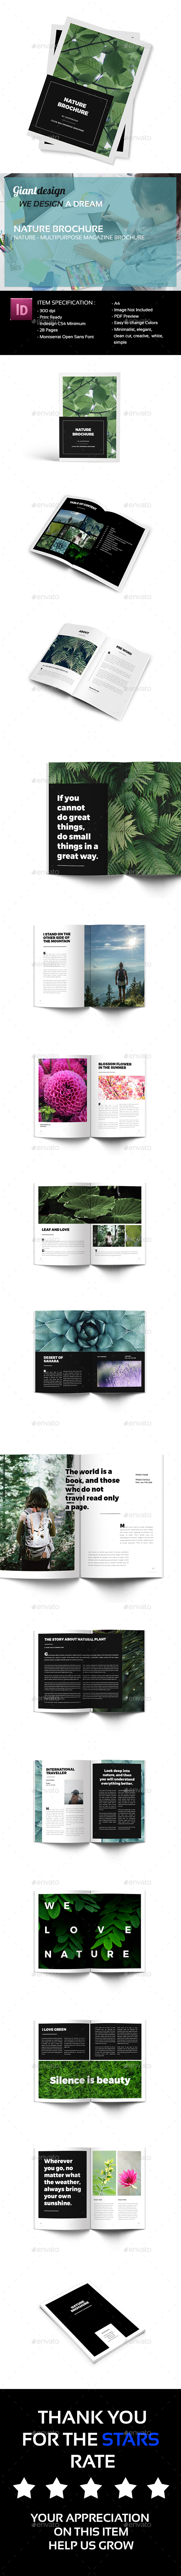 Nature - Multipurpose Magazine Brochure - Magazines Print Templates